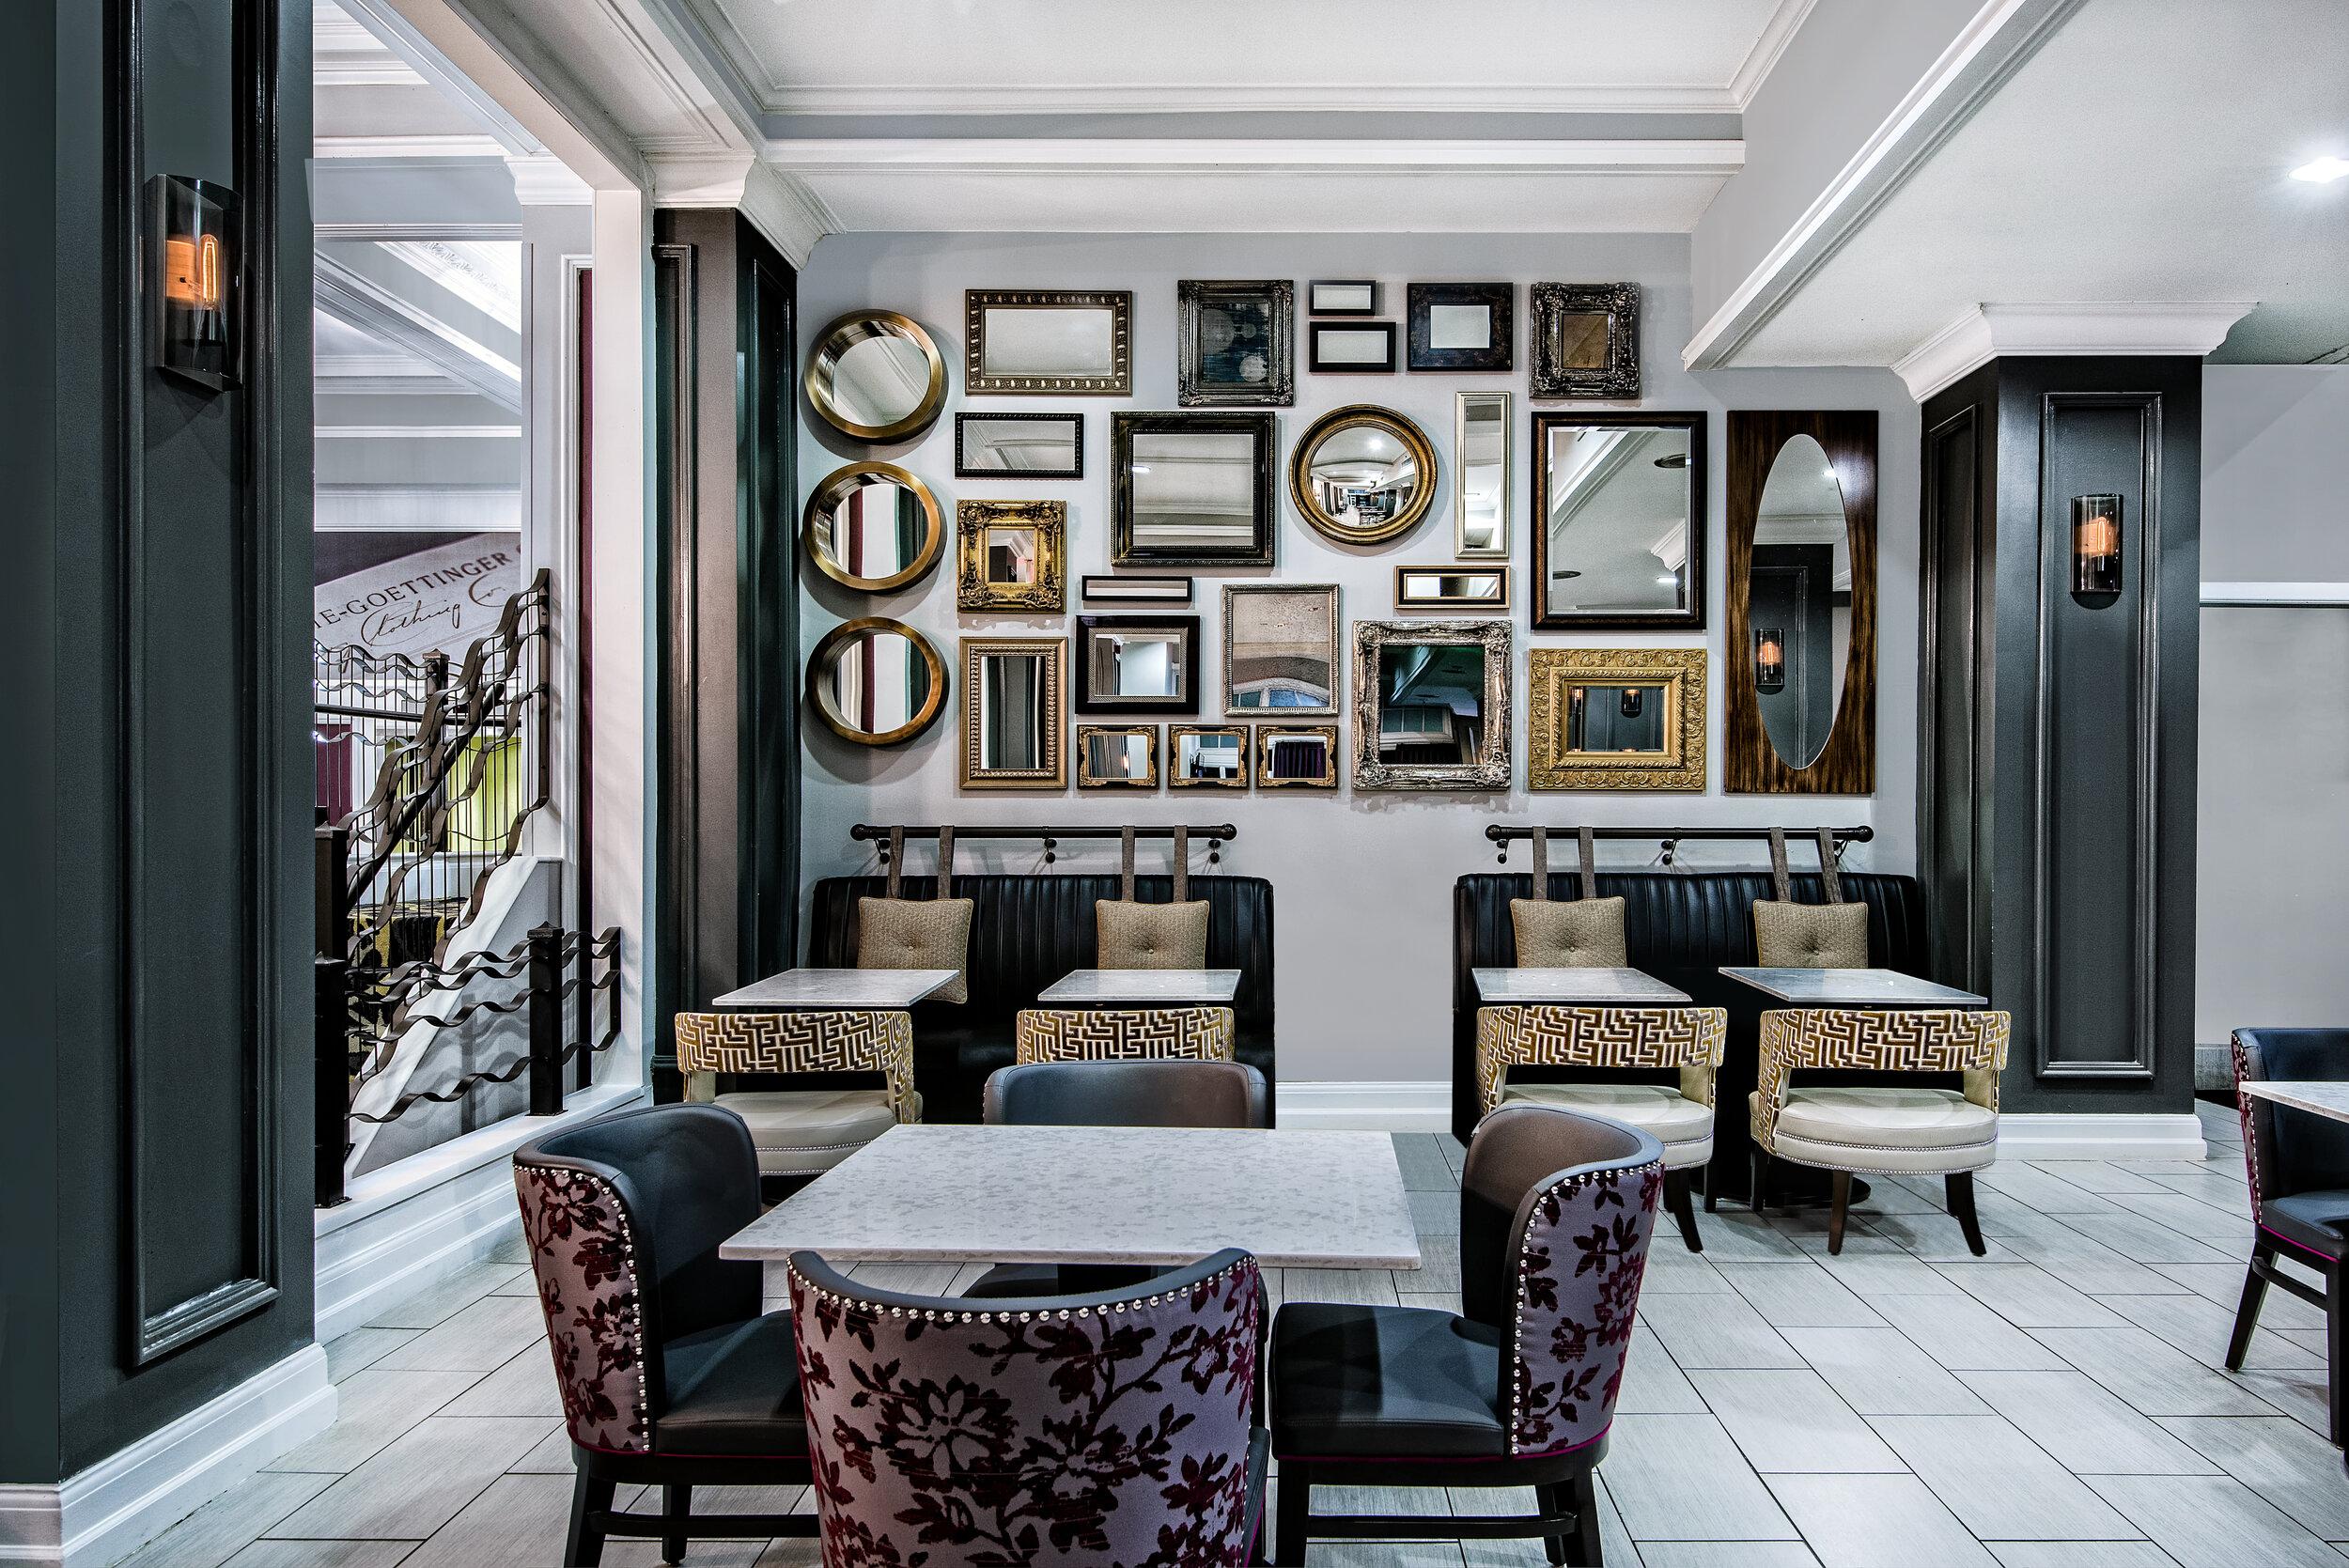 dalar-hotel-indigo-dallas-downtown-restaurant3.jpg